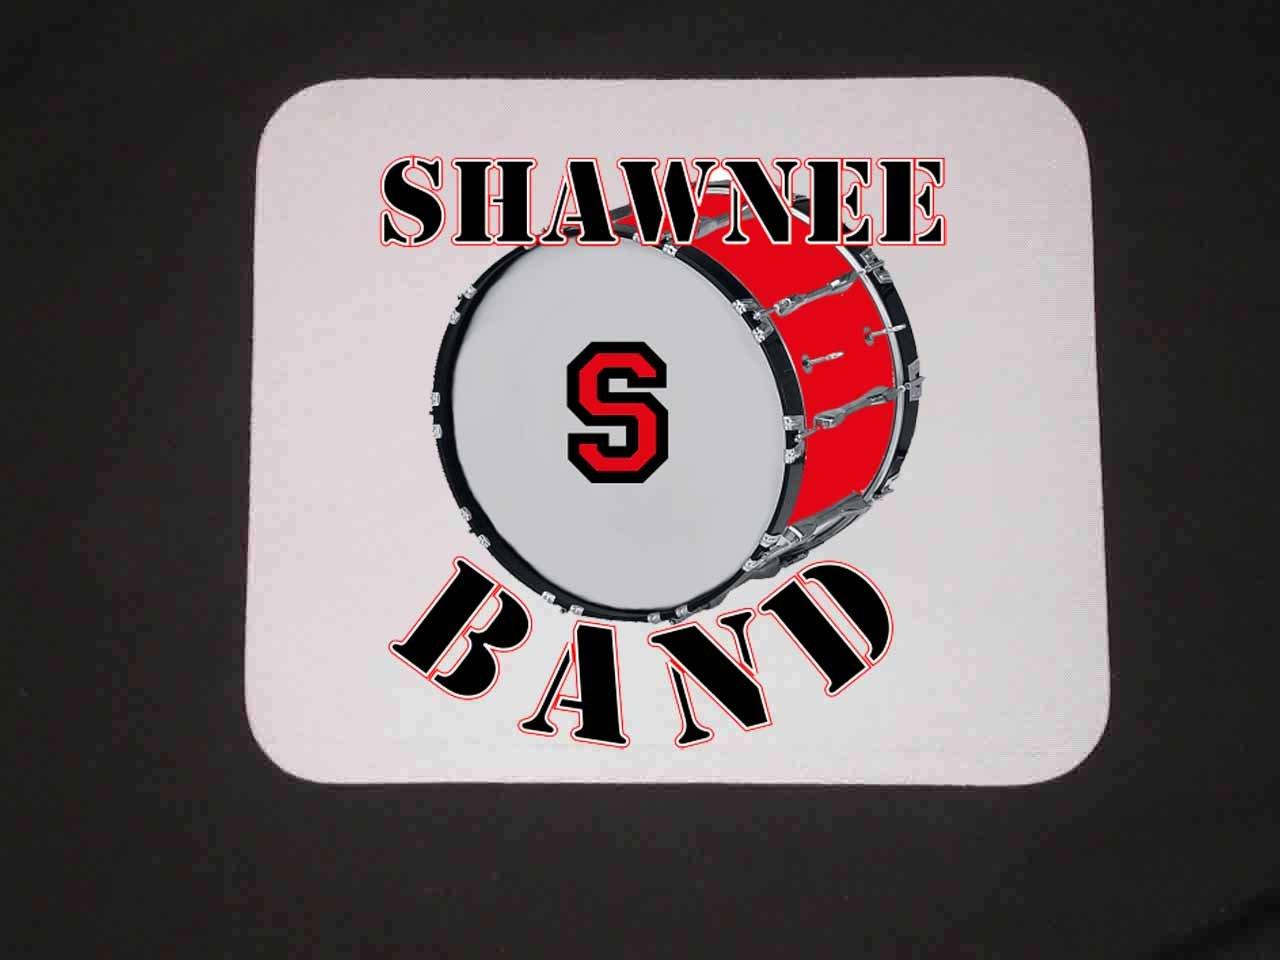 Shawnee Band Mousepad!